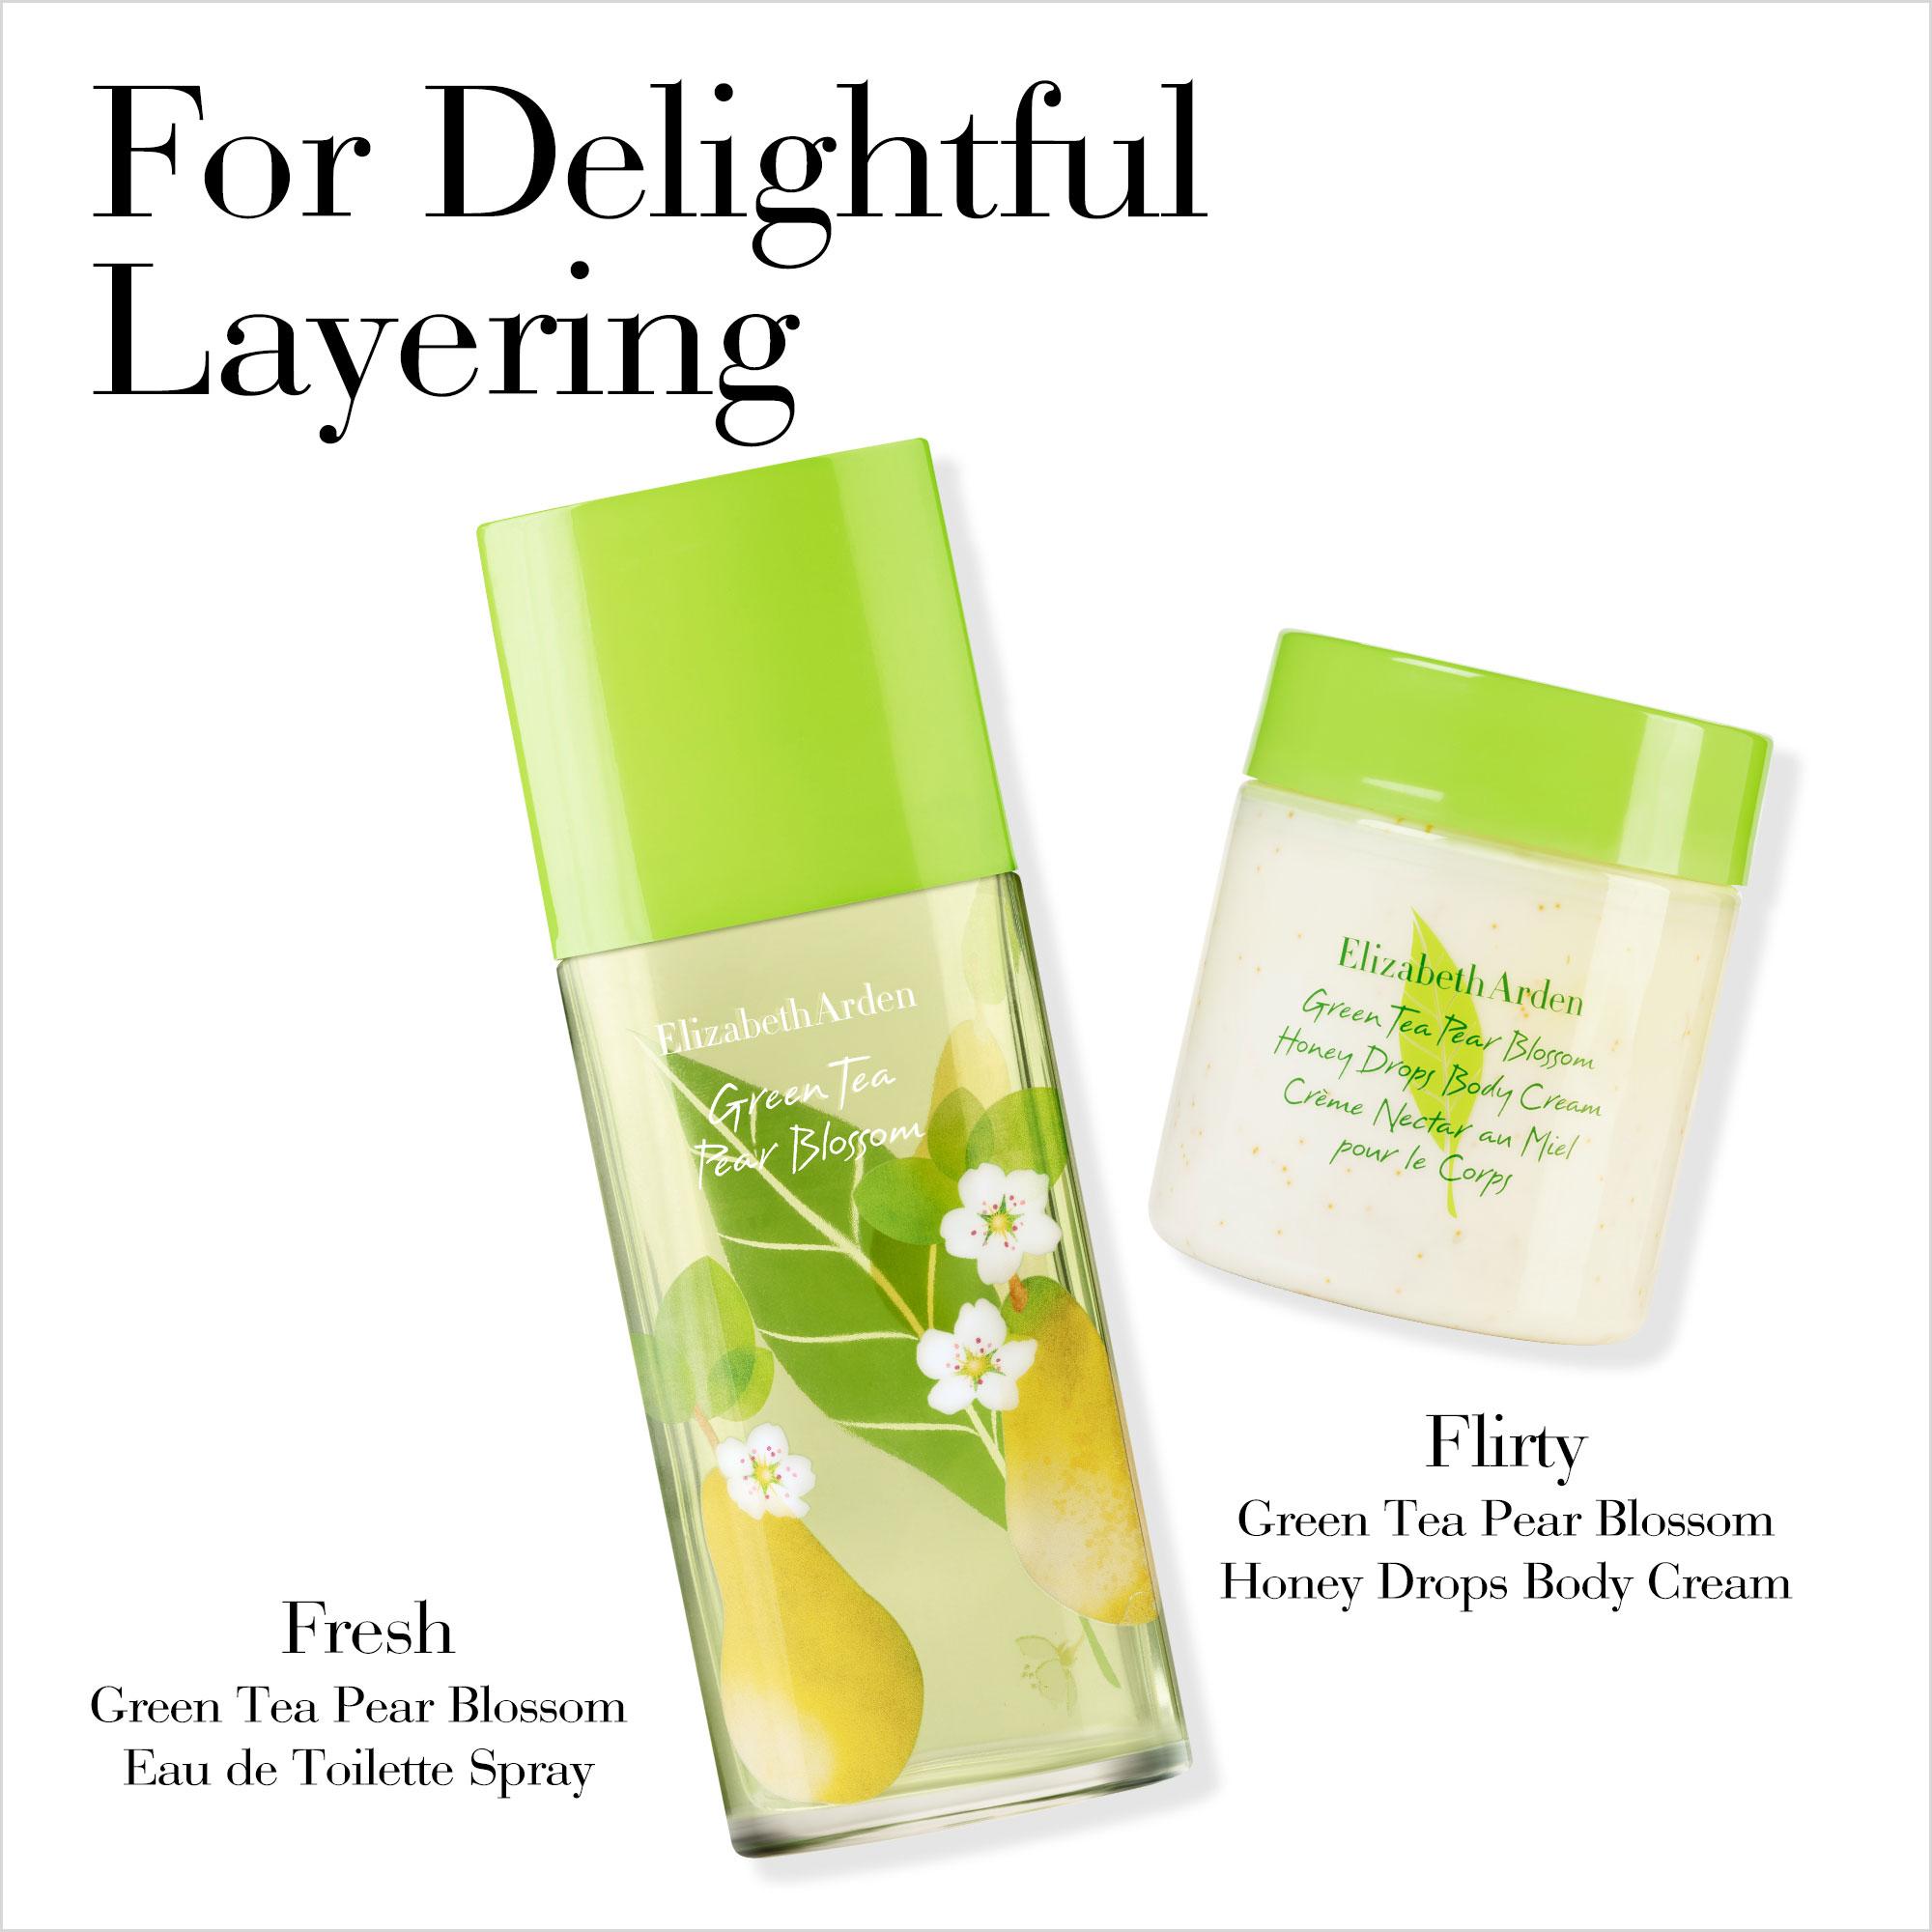 For Delightful Layering, Fresh Green Tea Pear Blossom Eau De Toilette Spray Plus Flirty Green Tea Pear Blossom Honey Drops Body Cream